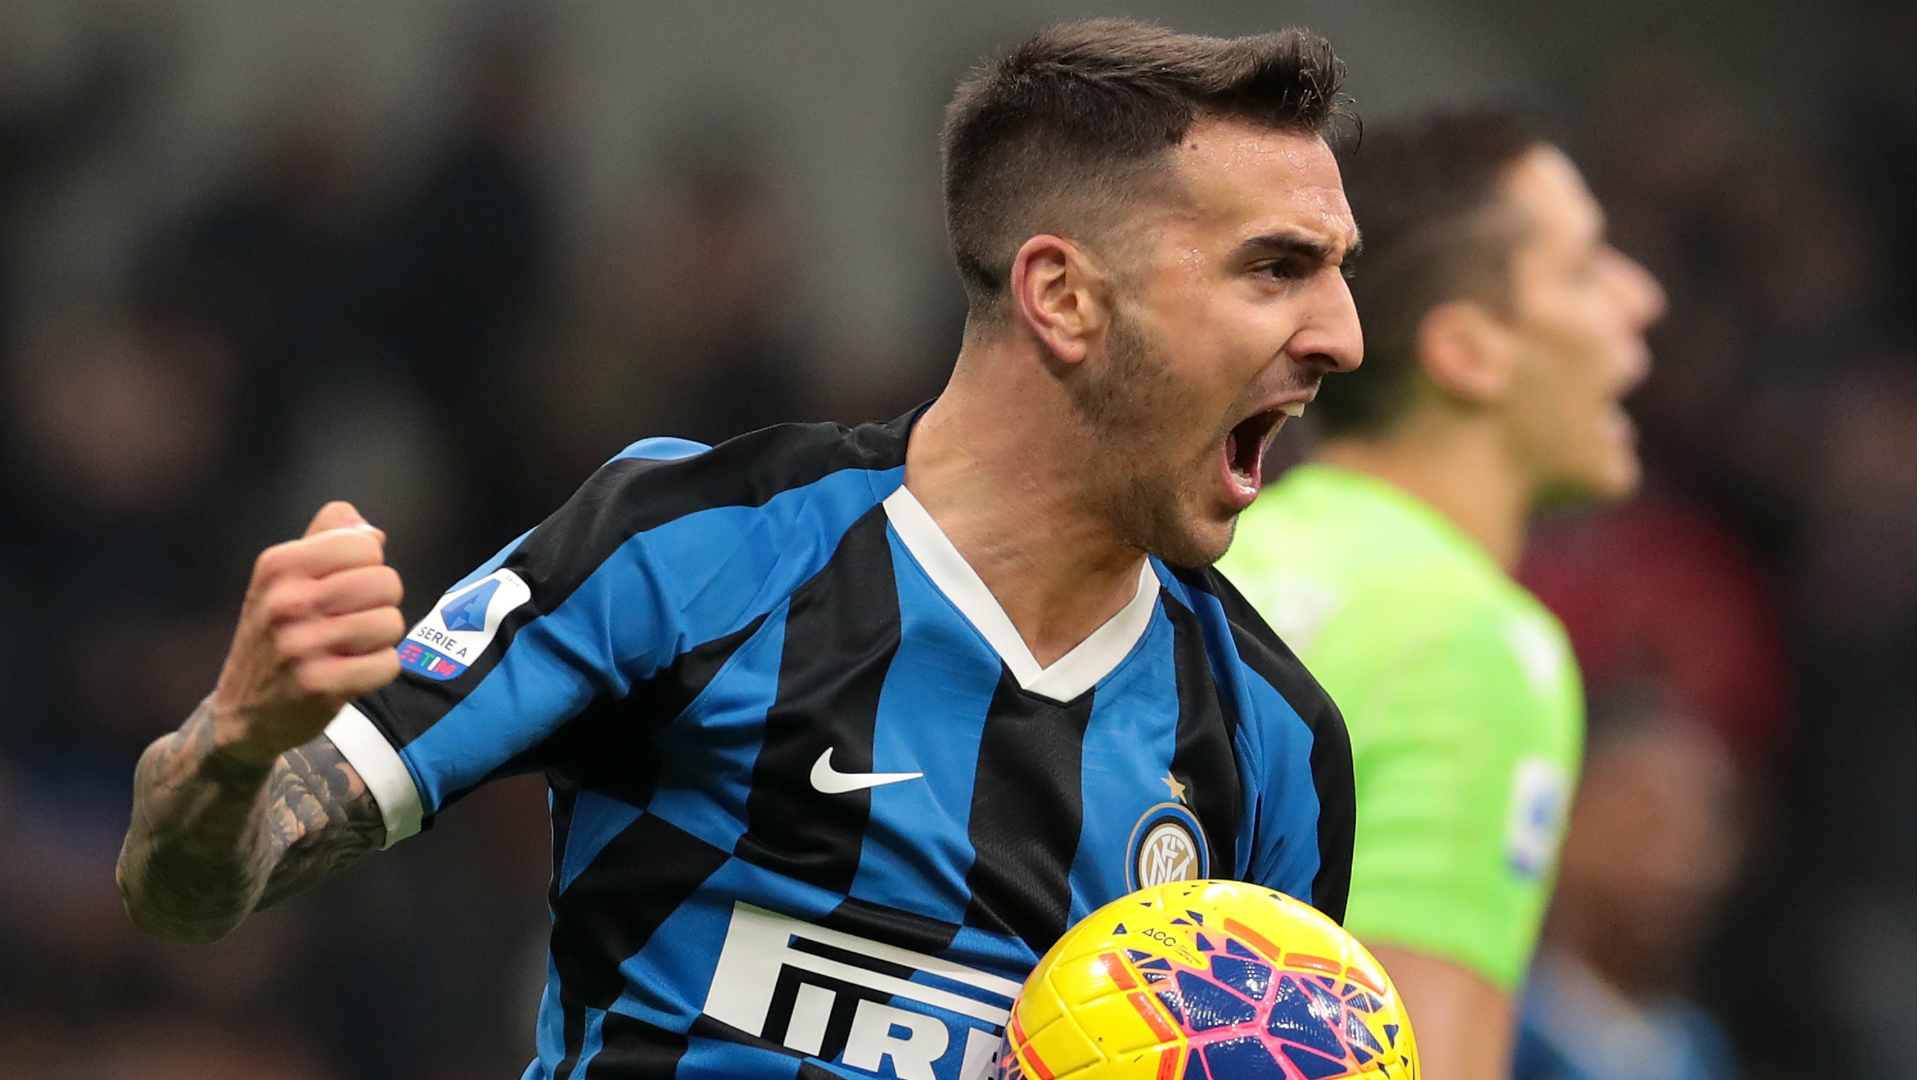 Inter 2-1 Hellas Verona: Barella hits stunning winner to send hosts top